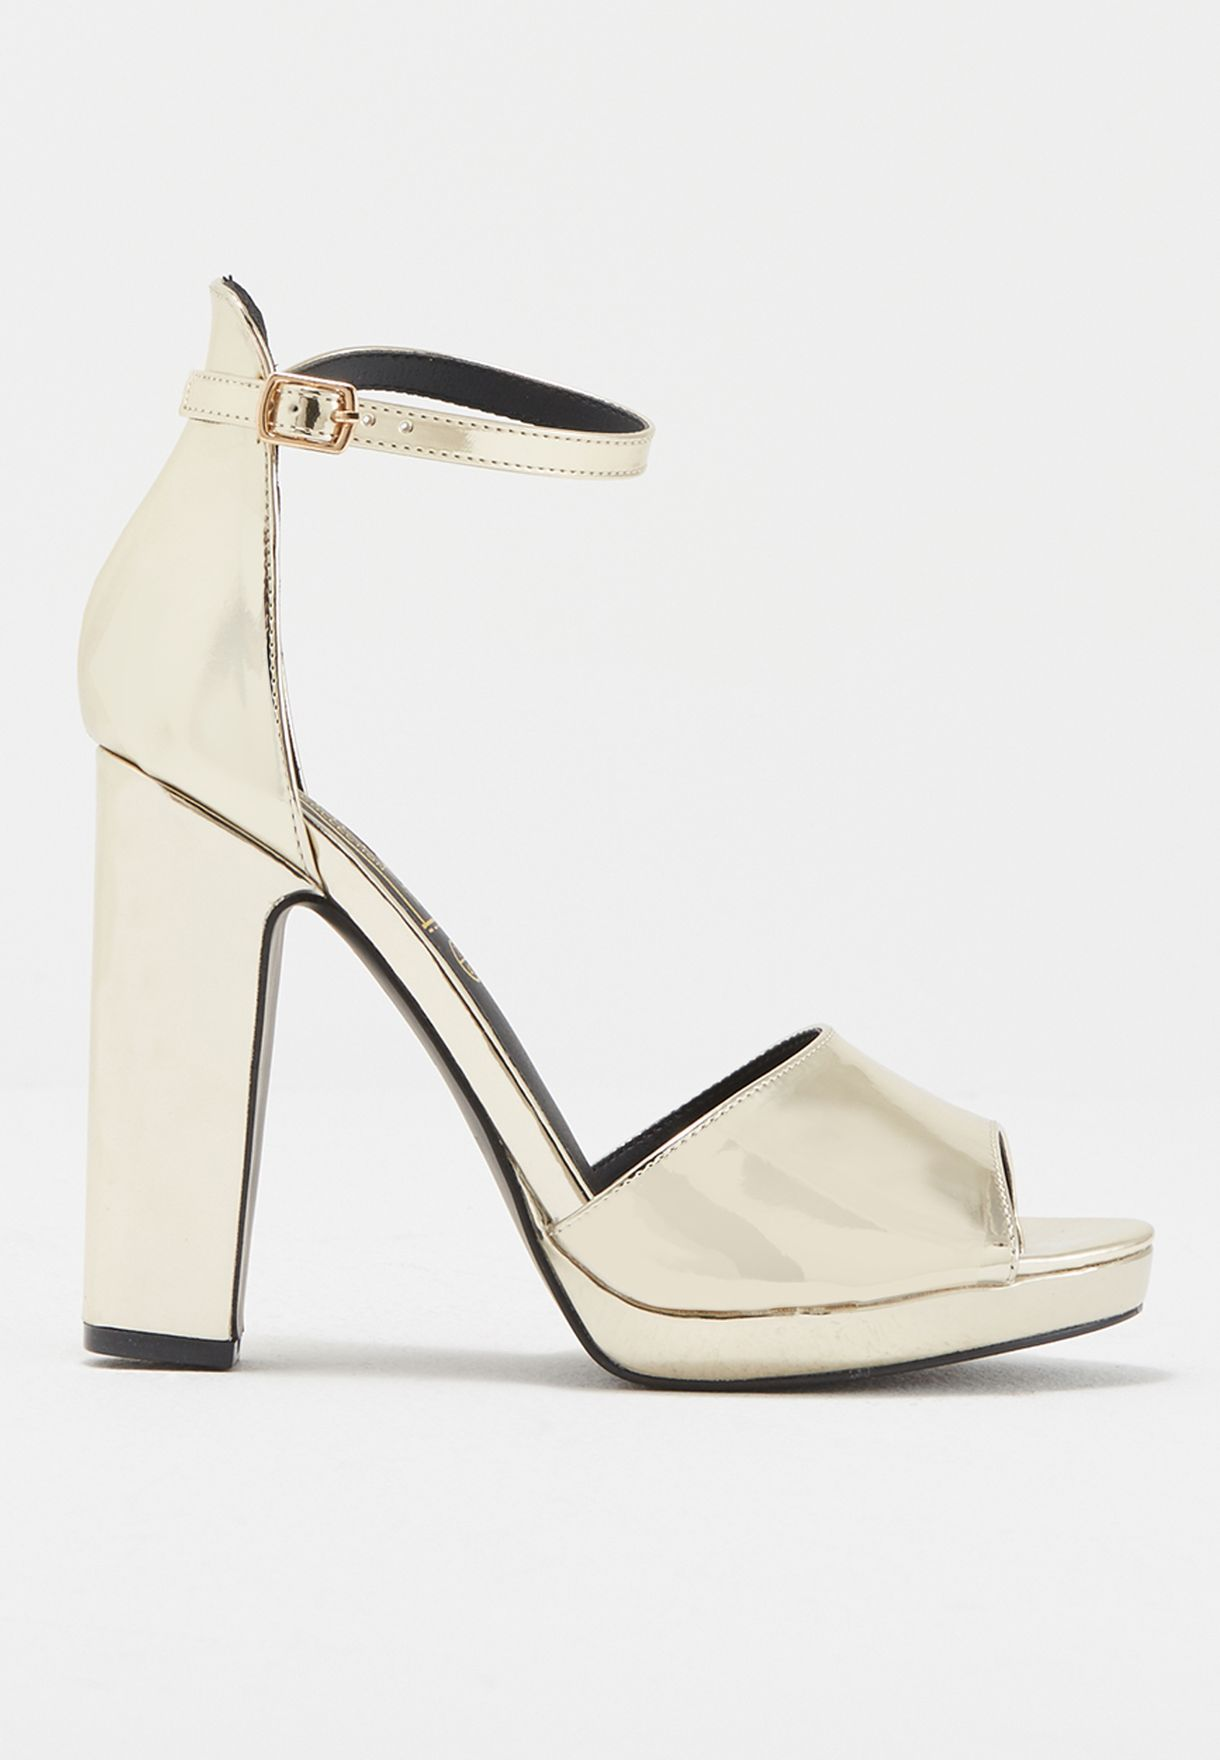 dfc18651e59 Shop Truffle silver Ankle Strap Block Heel LILA3 for Women in Qatar -  TR619SH47LPK